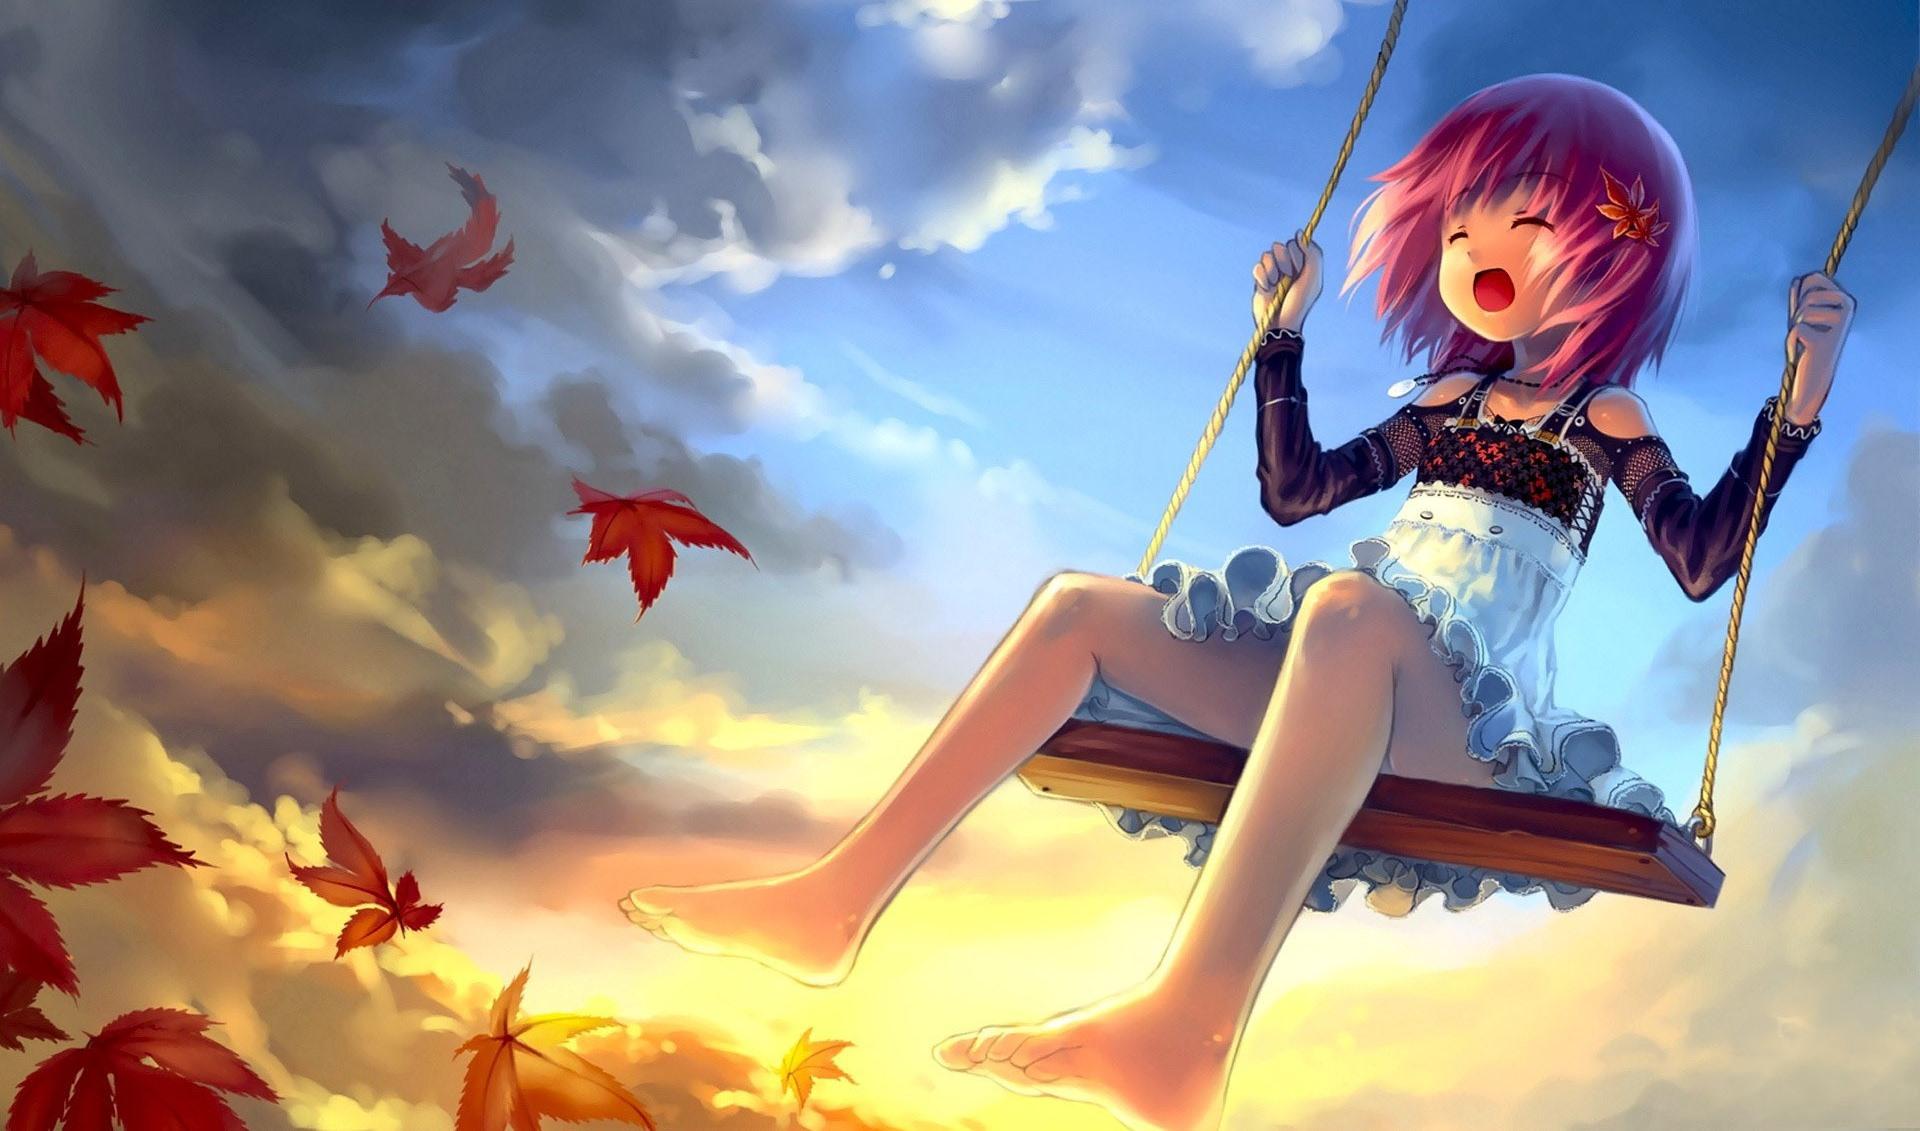 https://www.uplooder.net/img/image/50/add007a1a533112f2e8b04f2c0ca3c35/14666-girl-on-the-s_w_i_n_g-1920x1200-anime-wallpaper.jpg